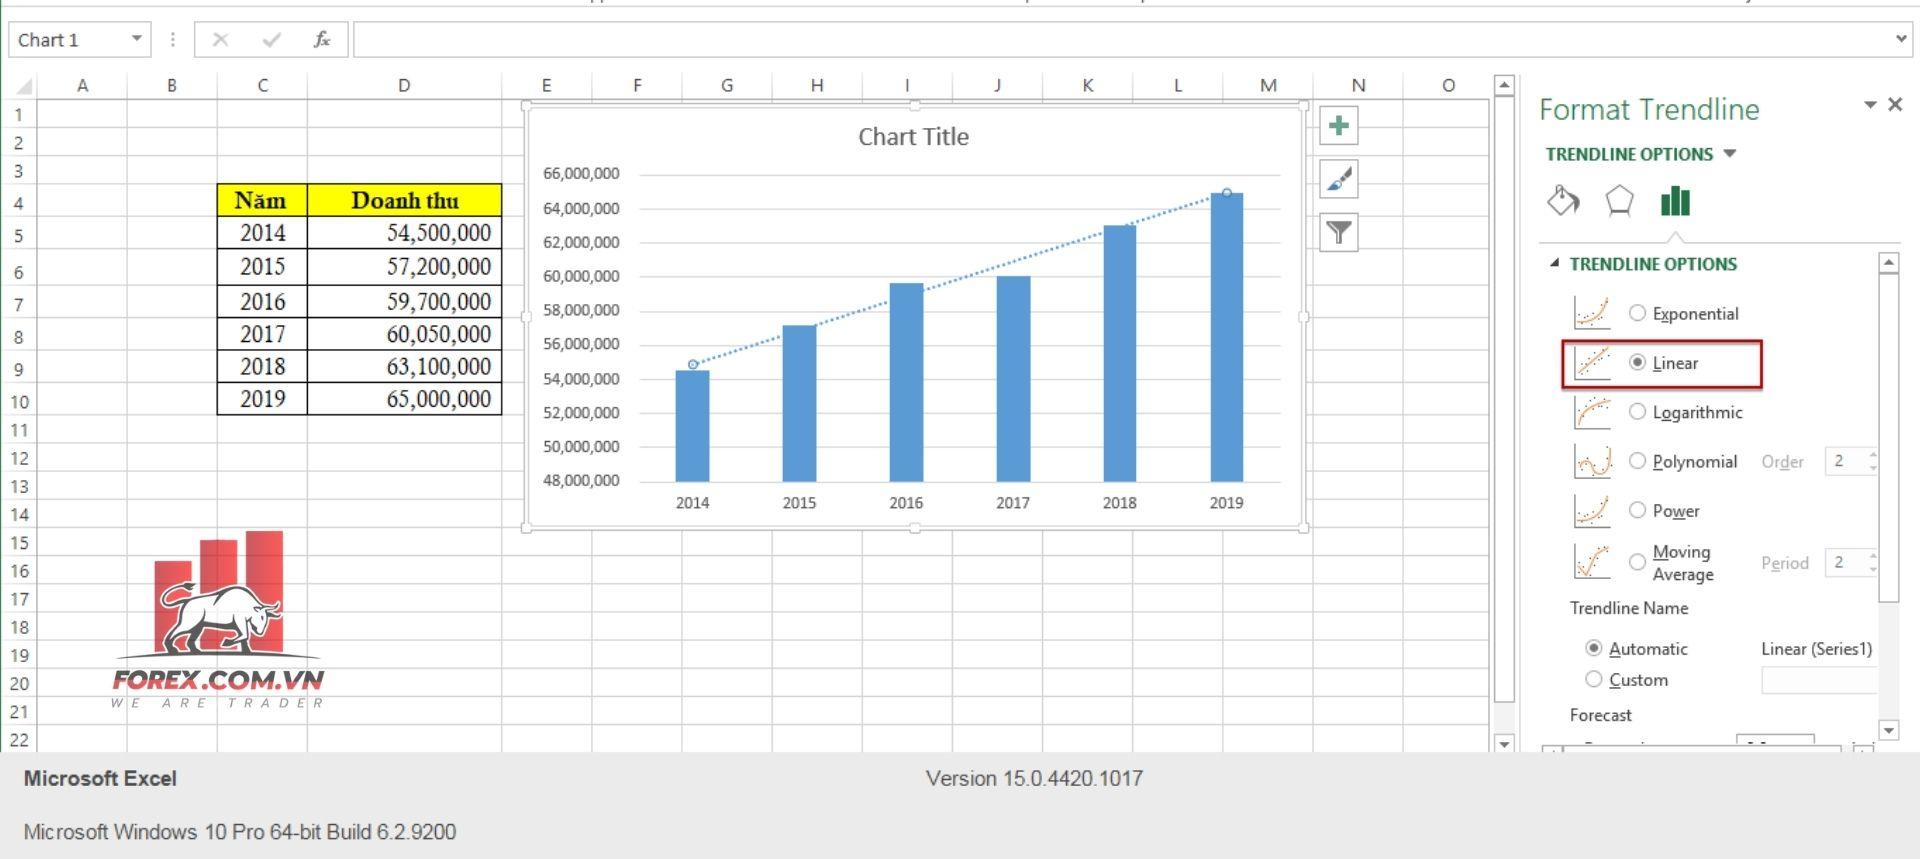 vẽ trendline bằng Excel 2